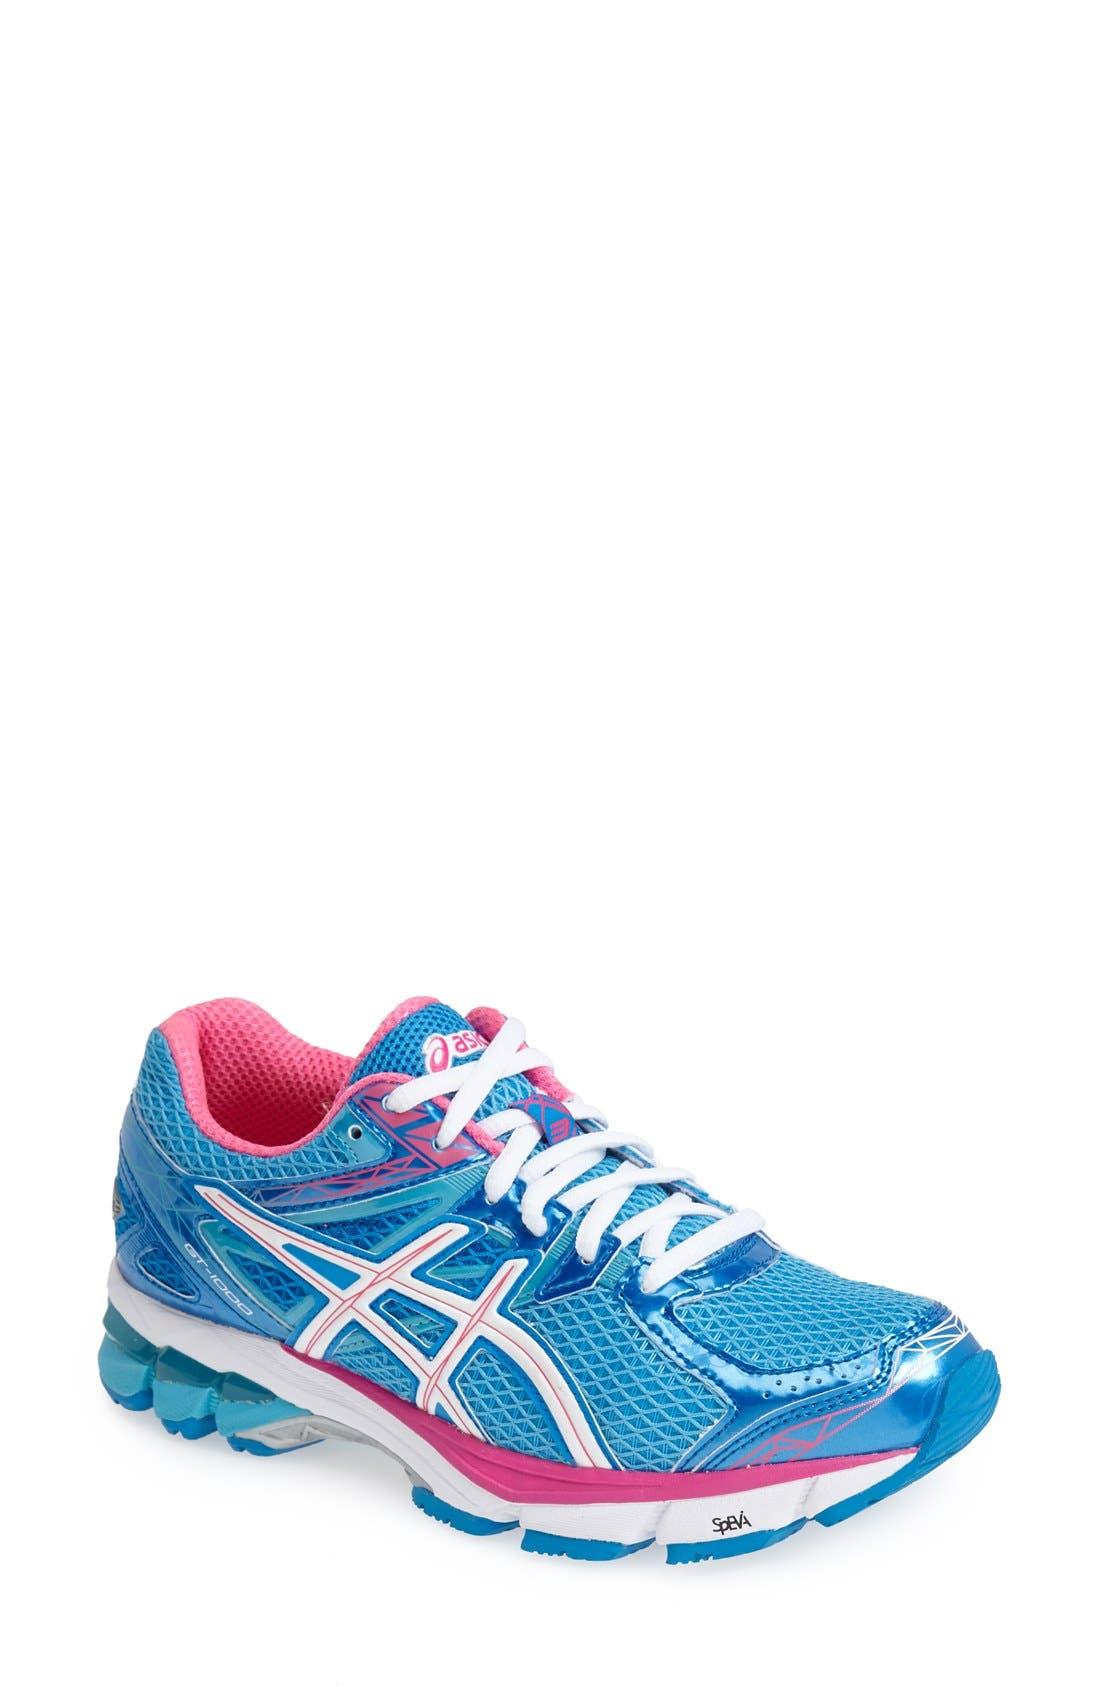 Main Image - ASICS® 'GT-1000™ 3' Running Shoe (Women)